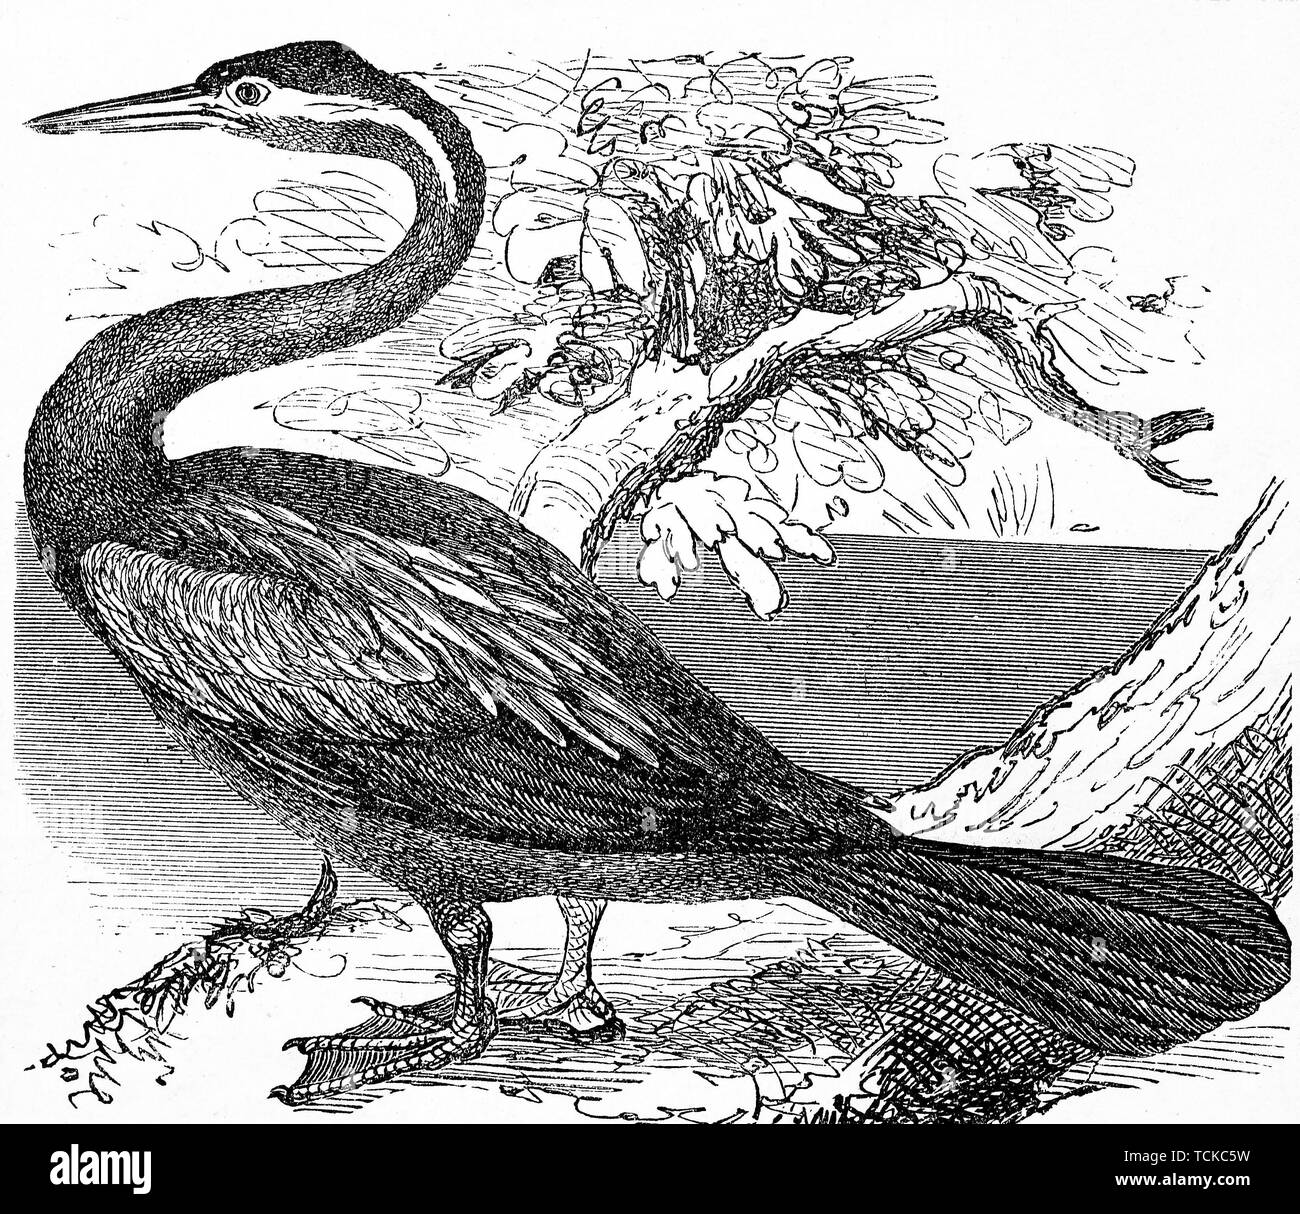 Anhinga, snakebird, darter, American darter, or water turkey, Schlangenhalsvogel, 1889, historical woodcut, France Stock Photo